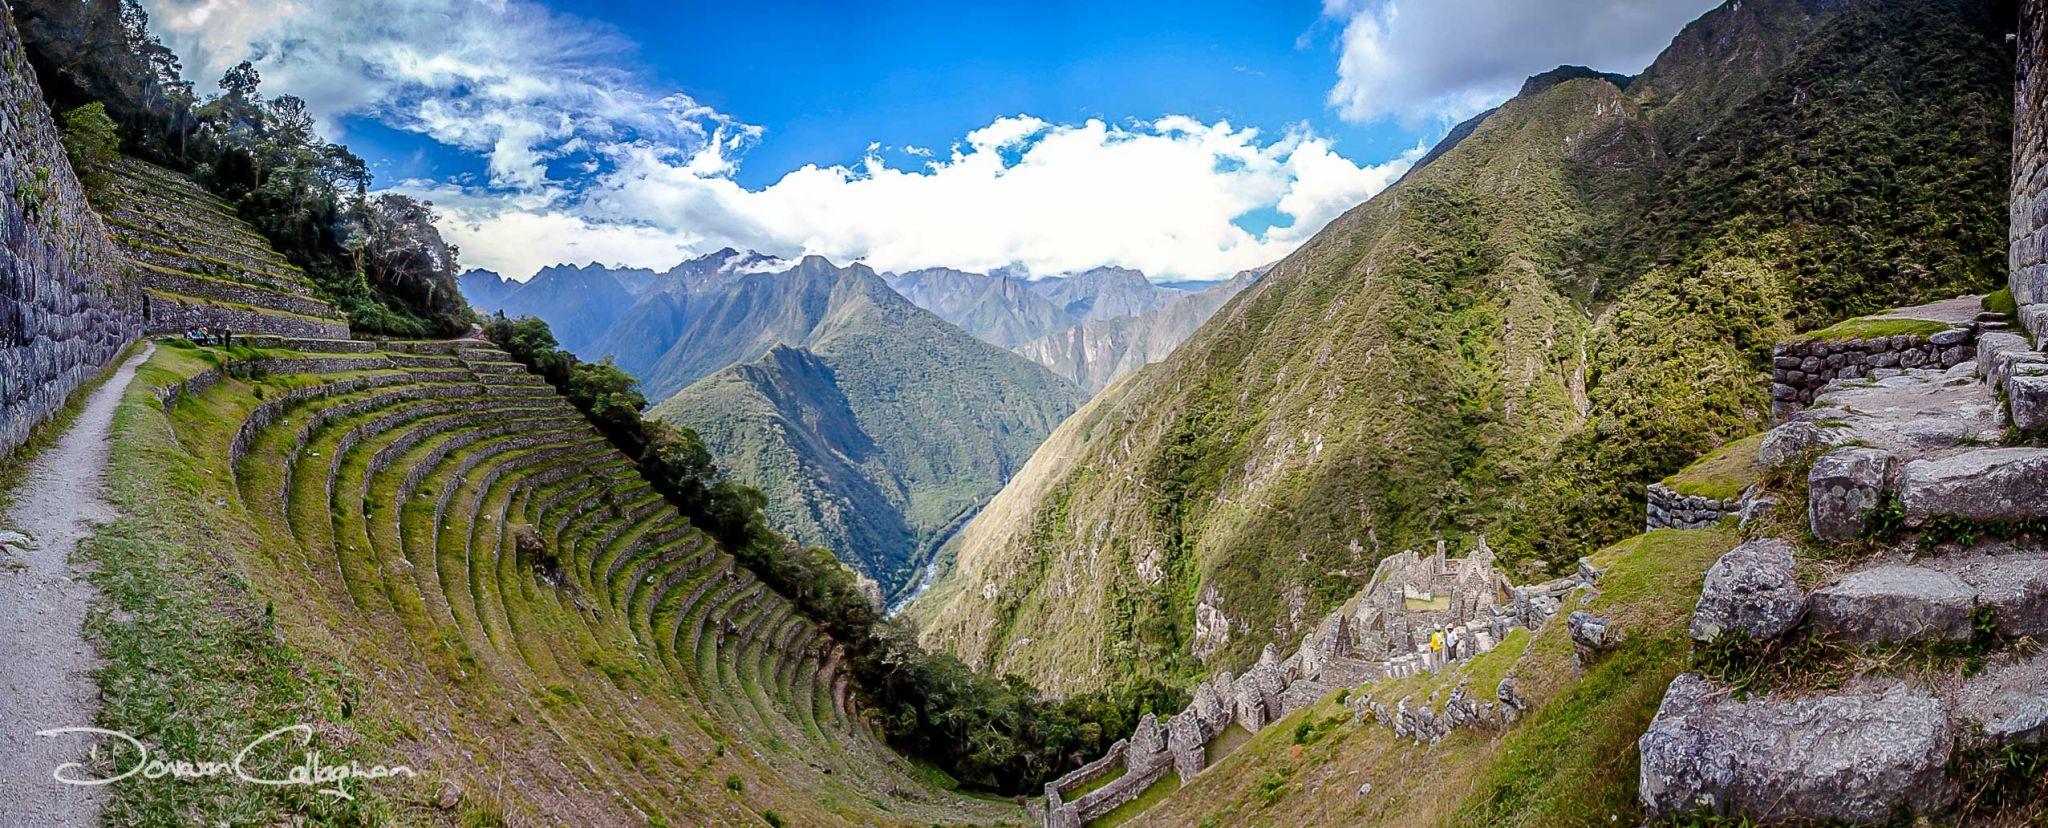 Mini Machu Picchu Winay Wayna, Peru